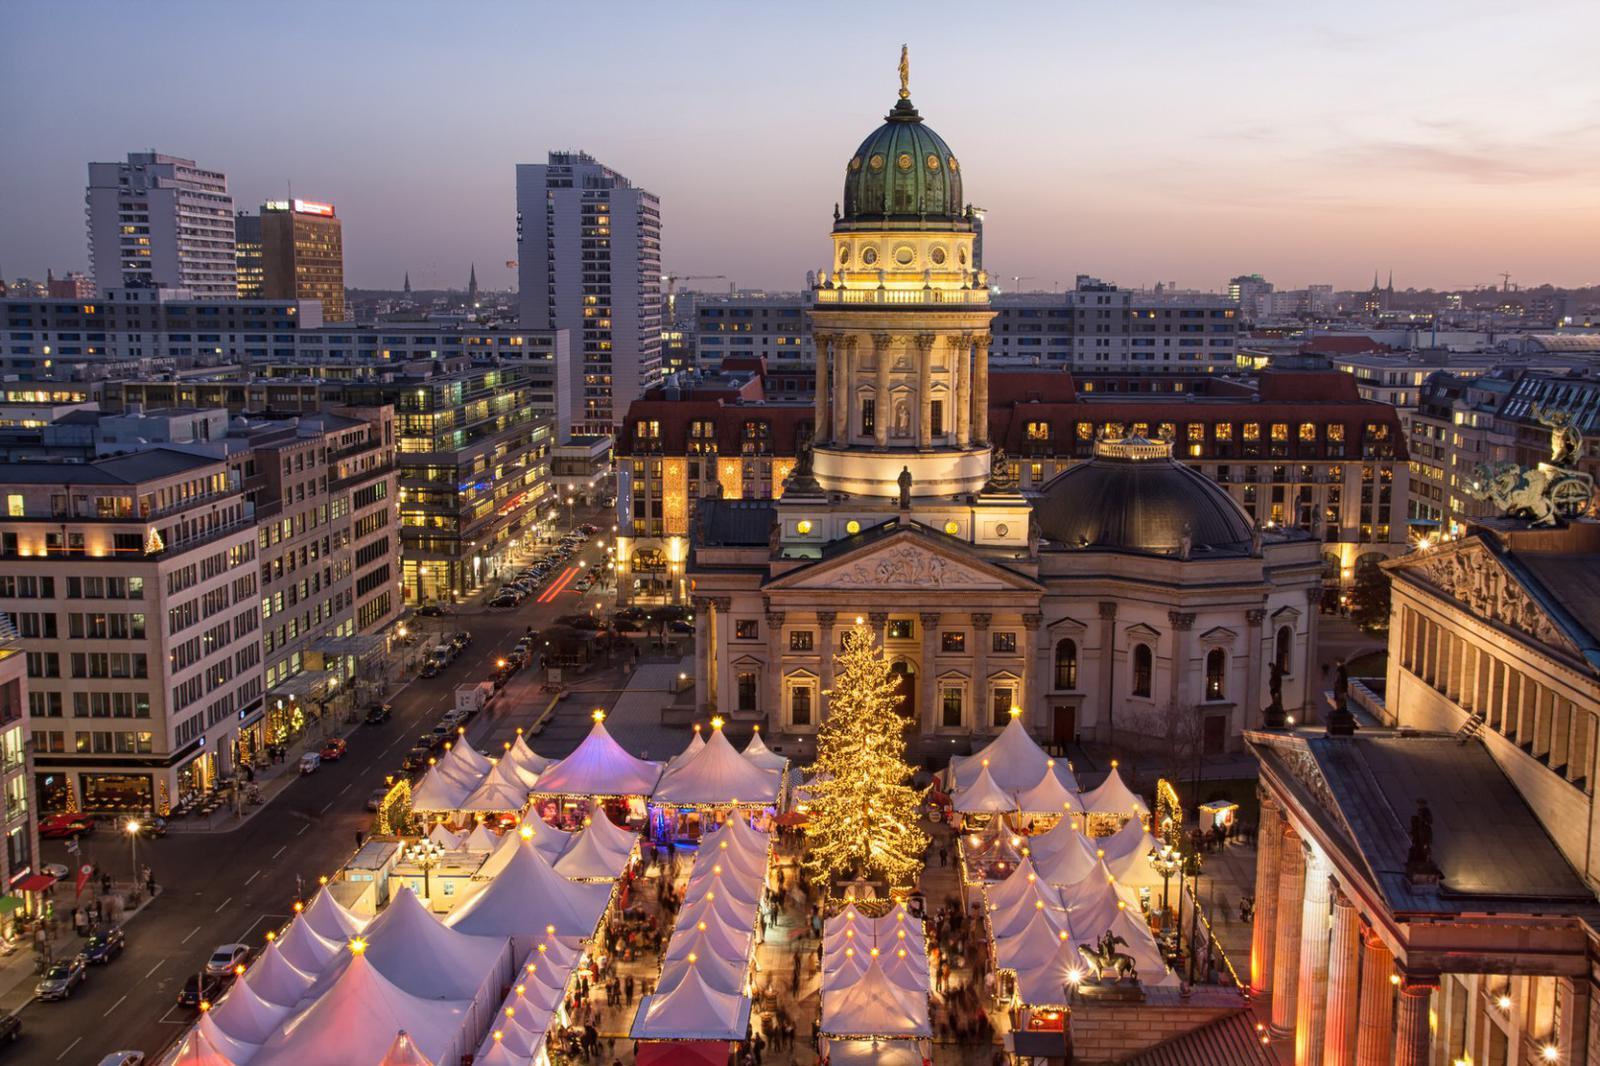 Berlin Christmas